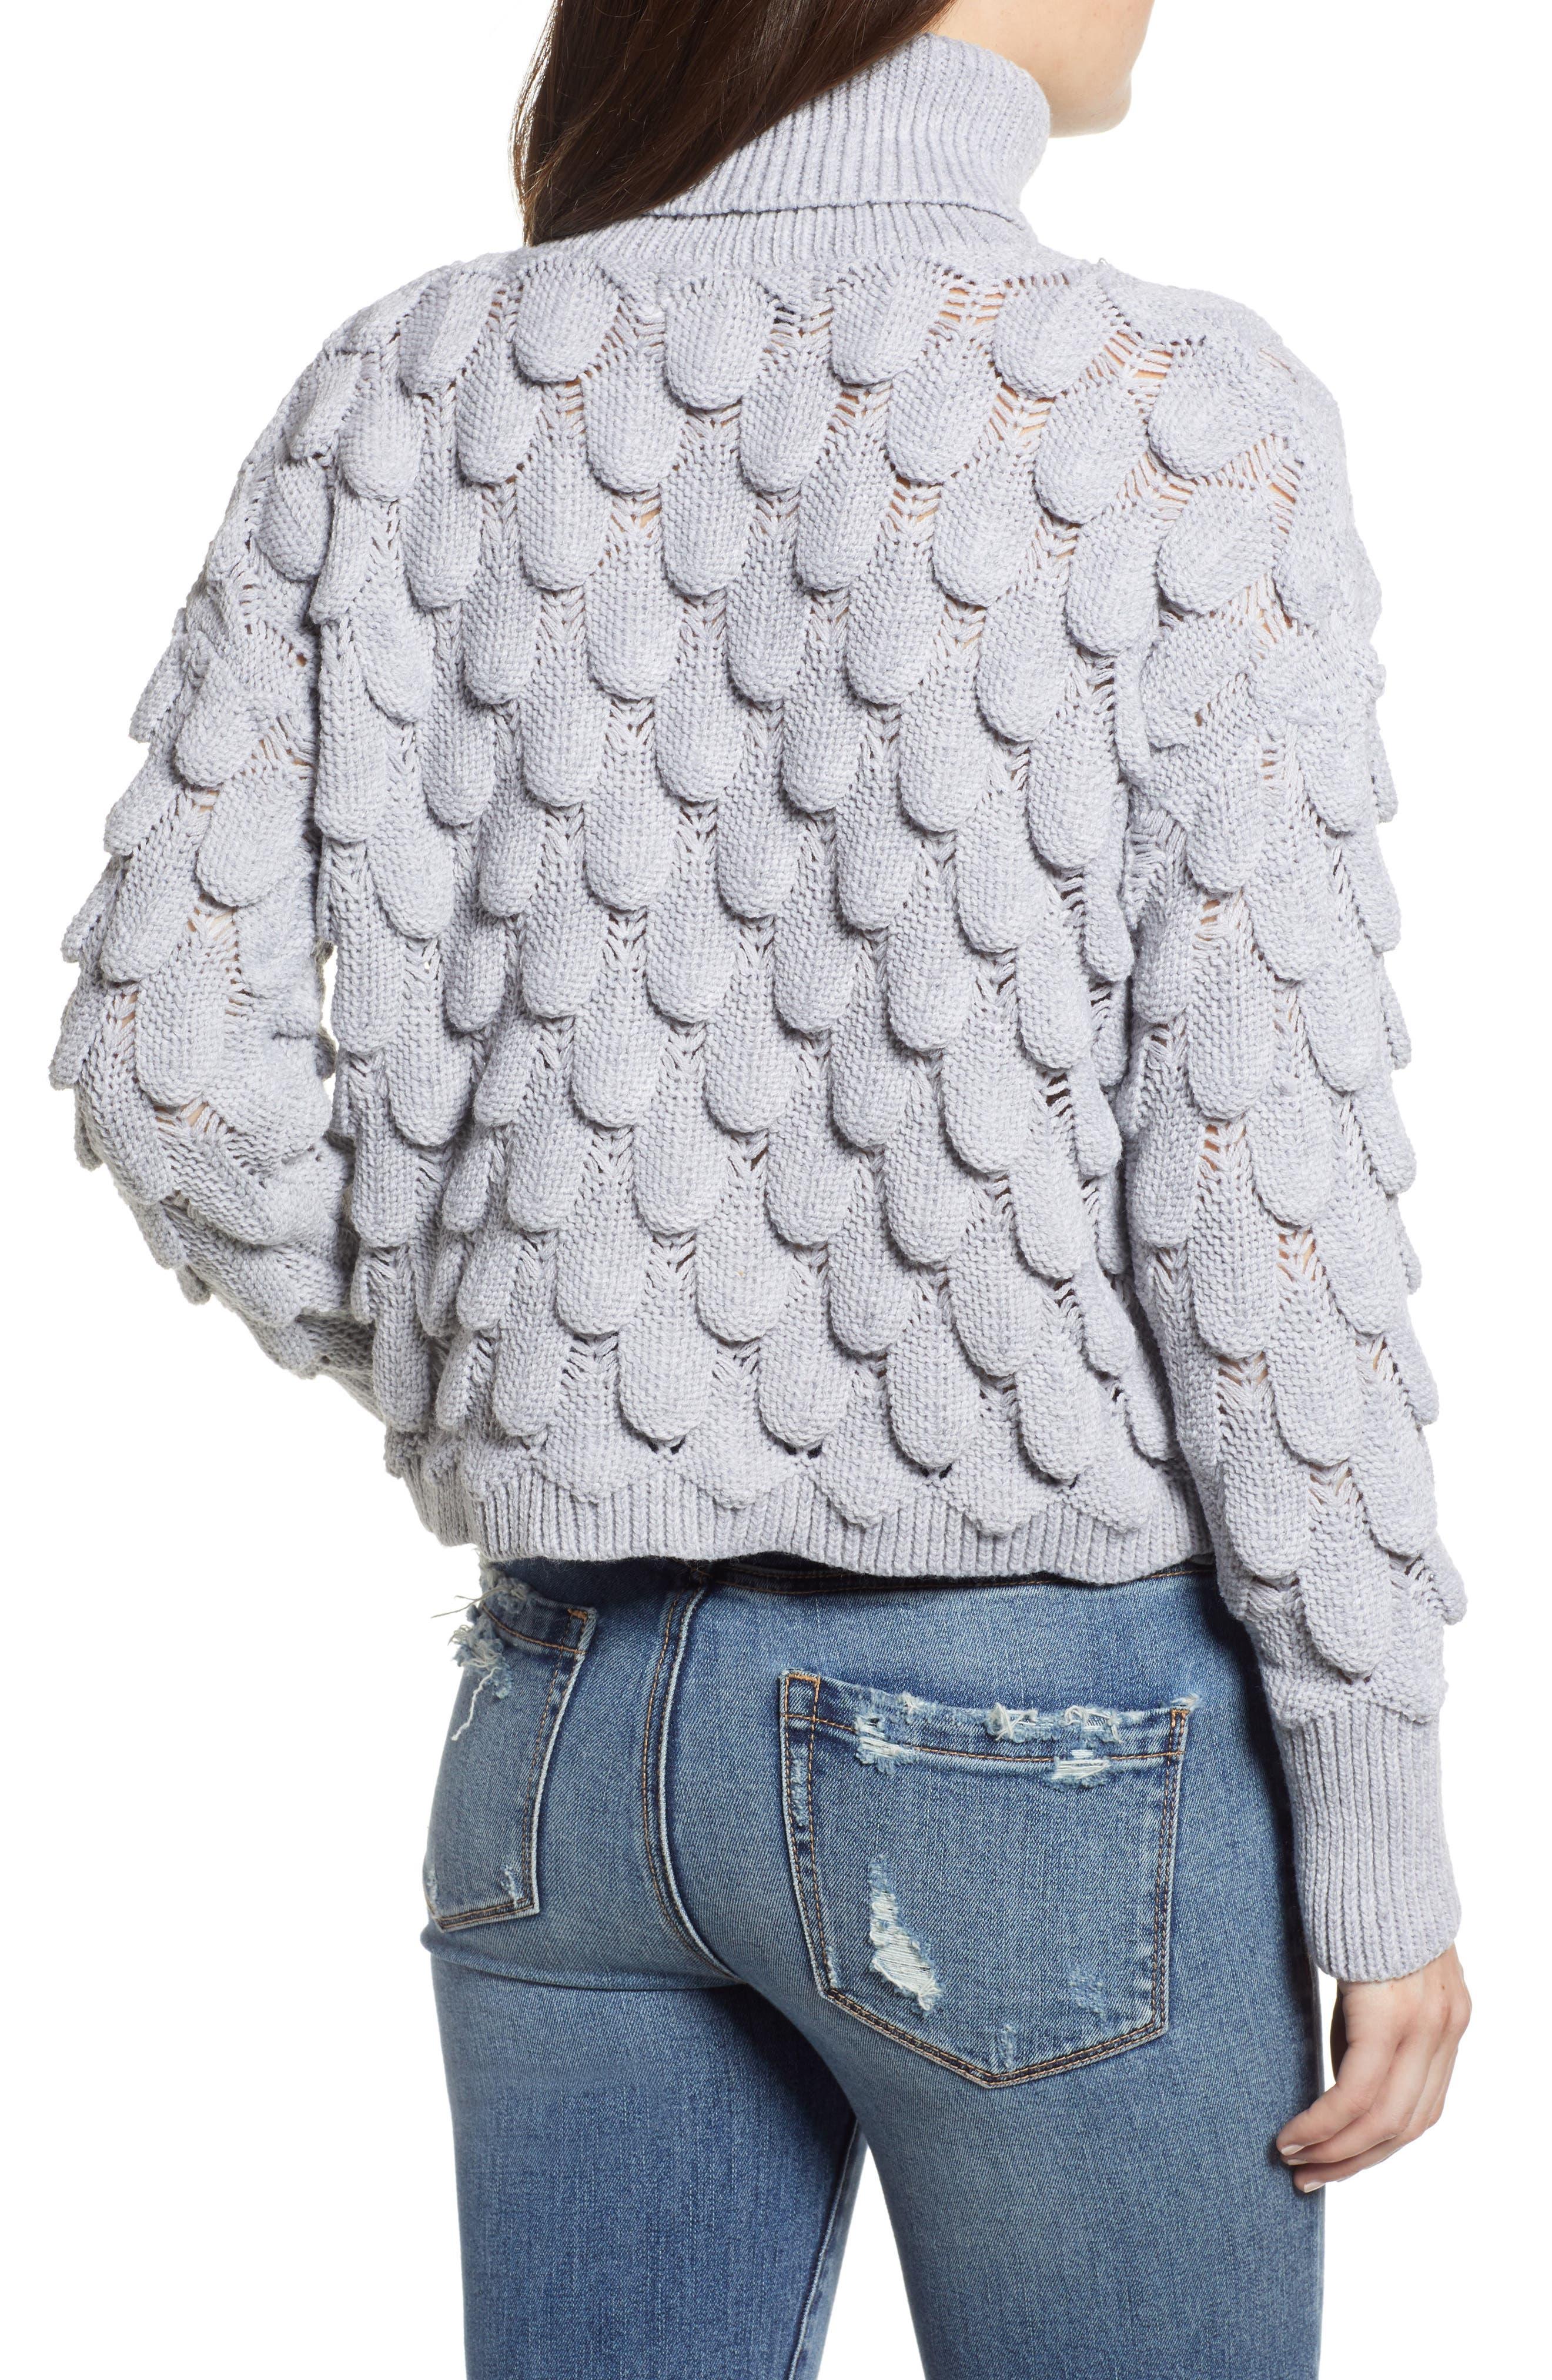 Scallop Stitch Sweater,                             Alternate thumbnail 2, color,                             038